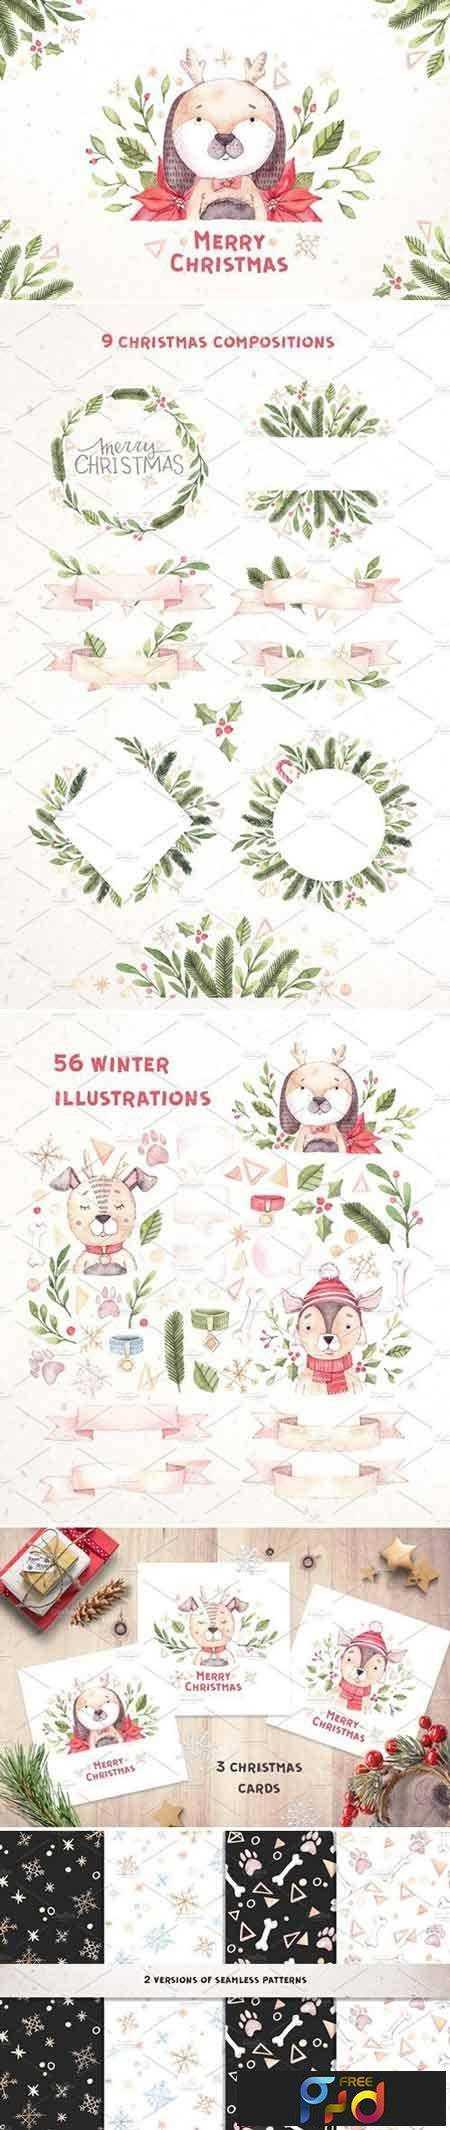 1709068 Watercolor christmas dogs kit. Xmas 2071392 1